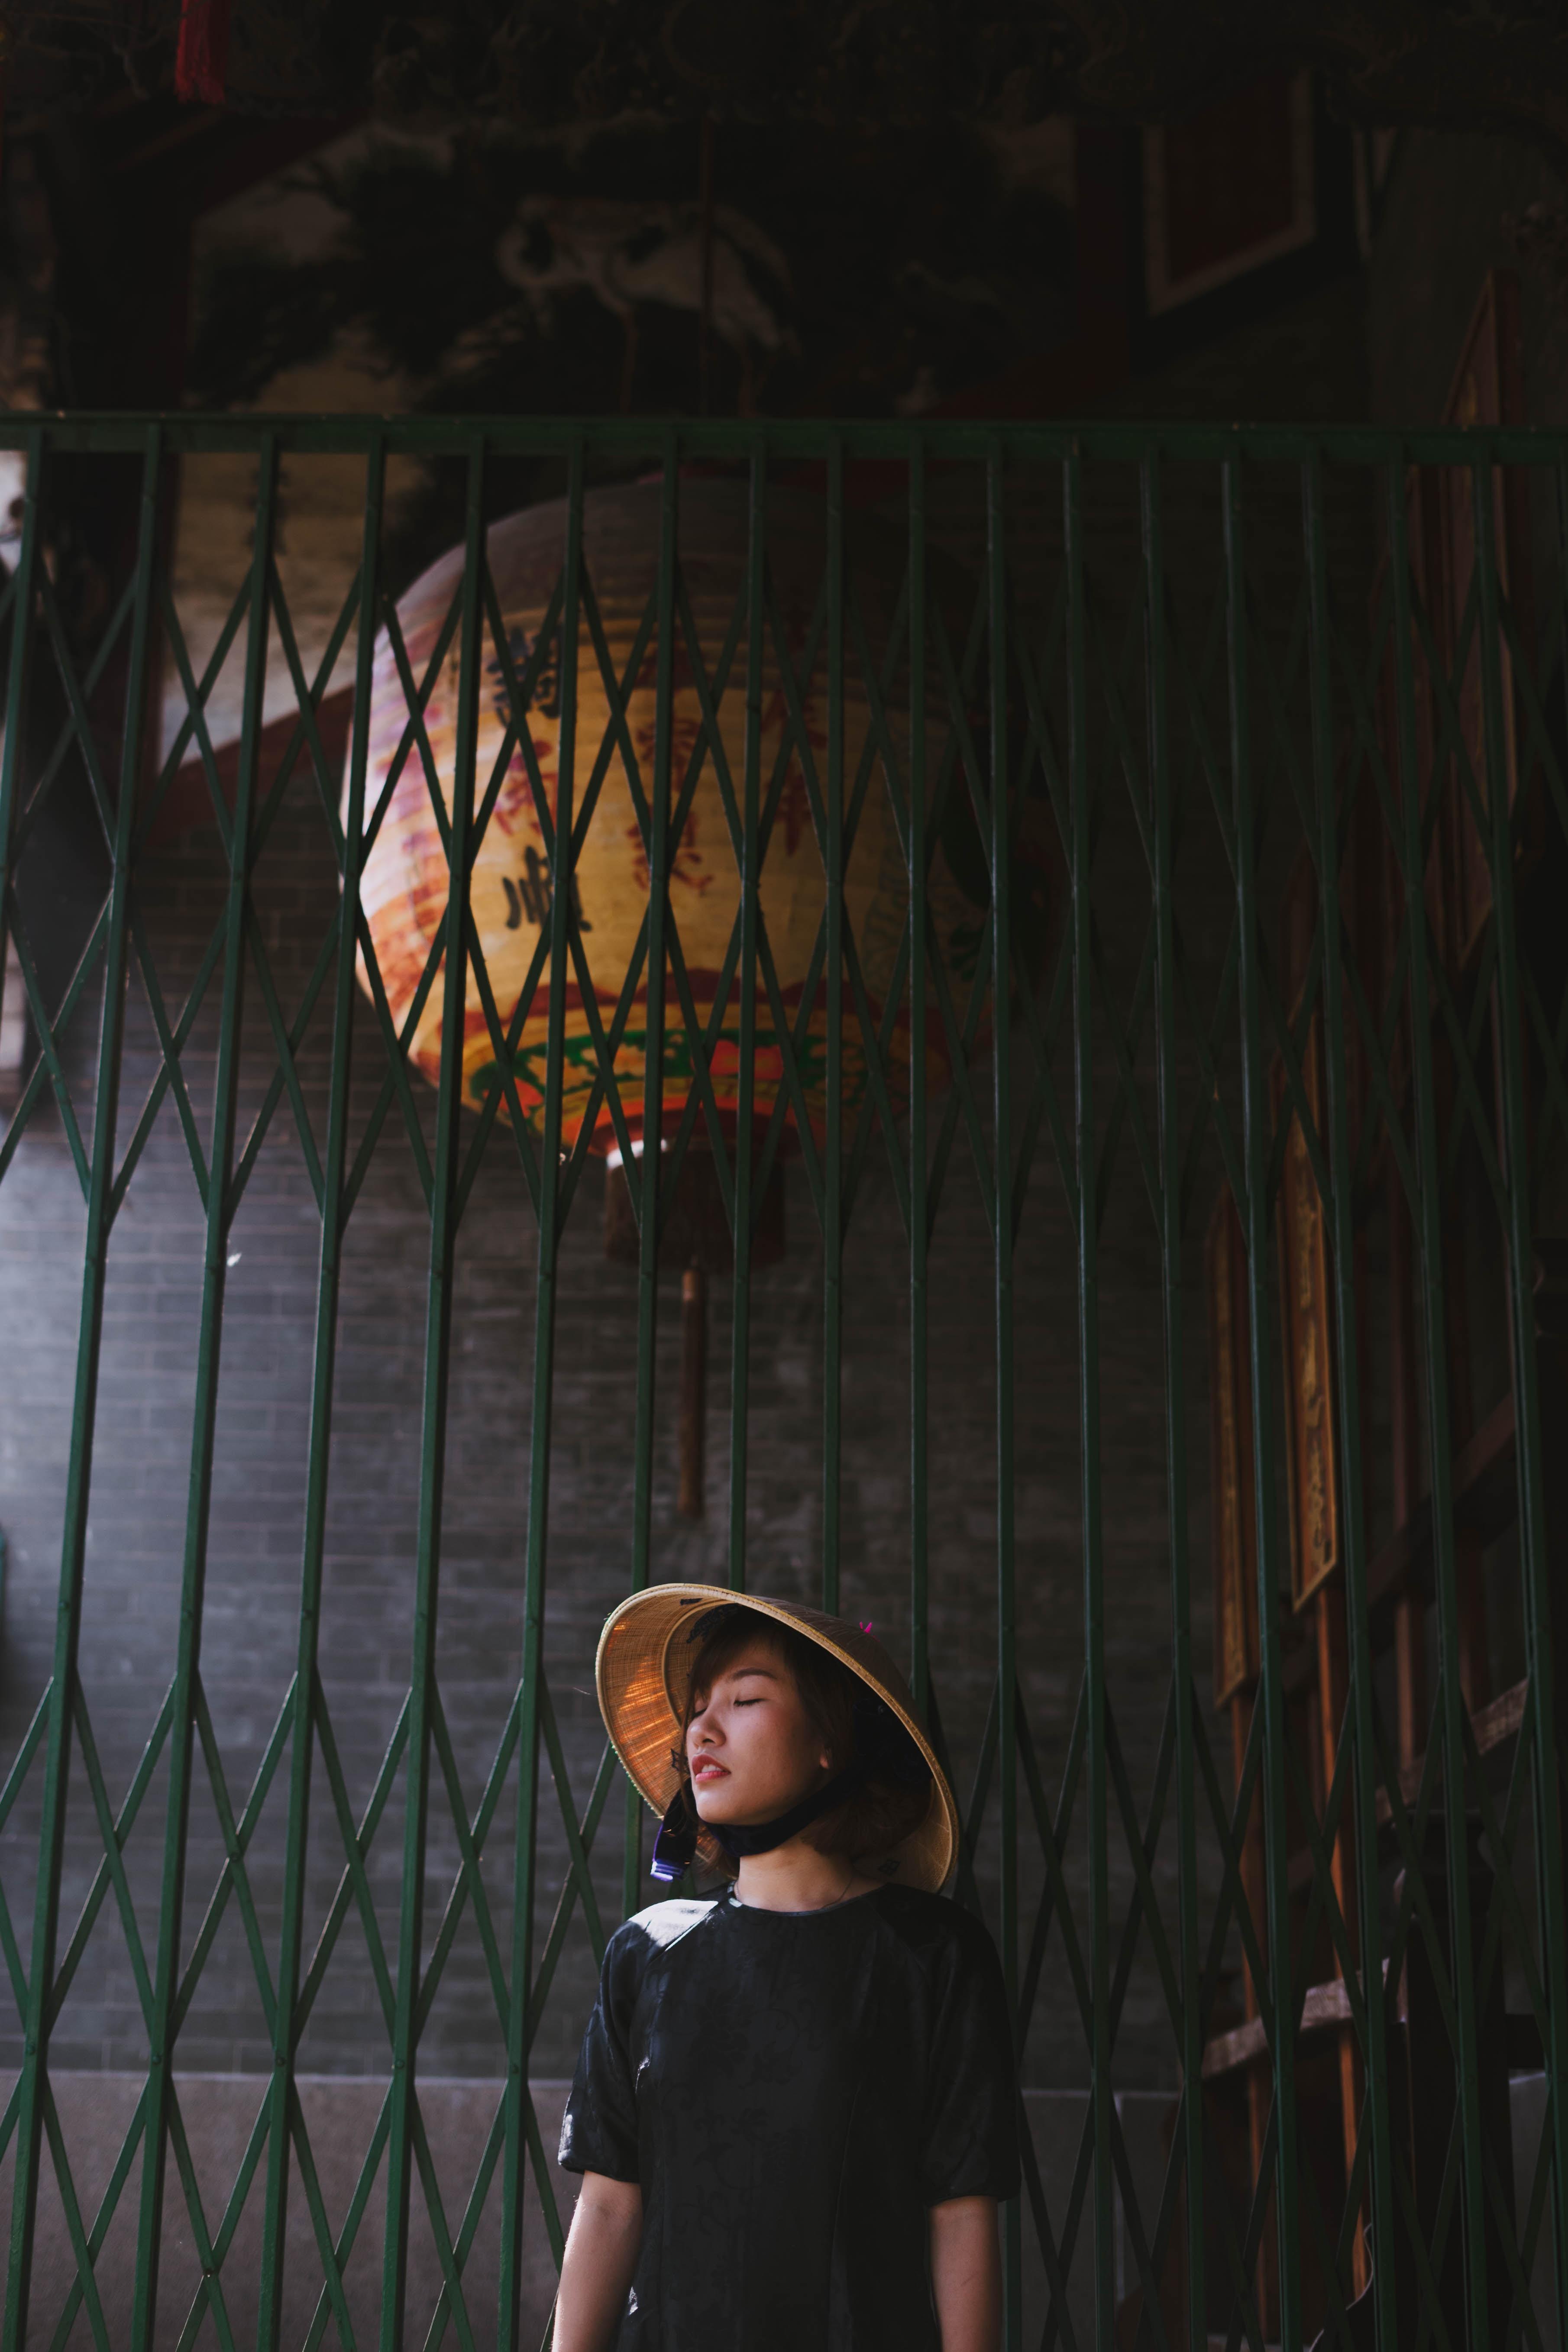 woman wearing brown bamboo hat standing near metal gate